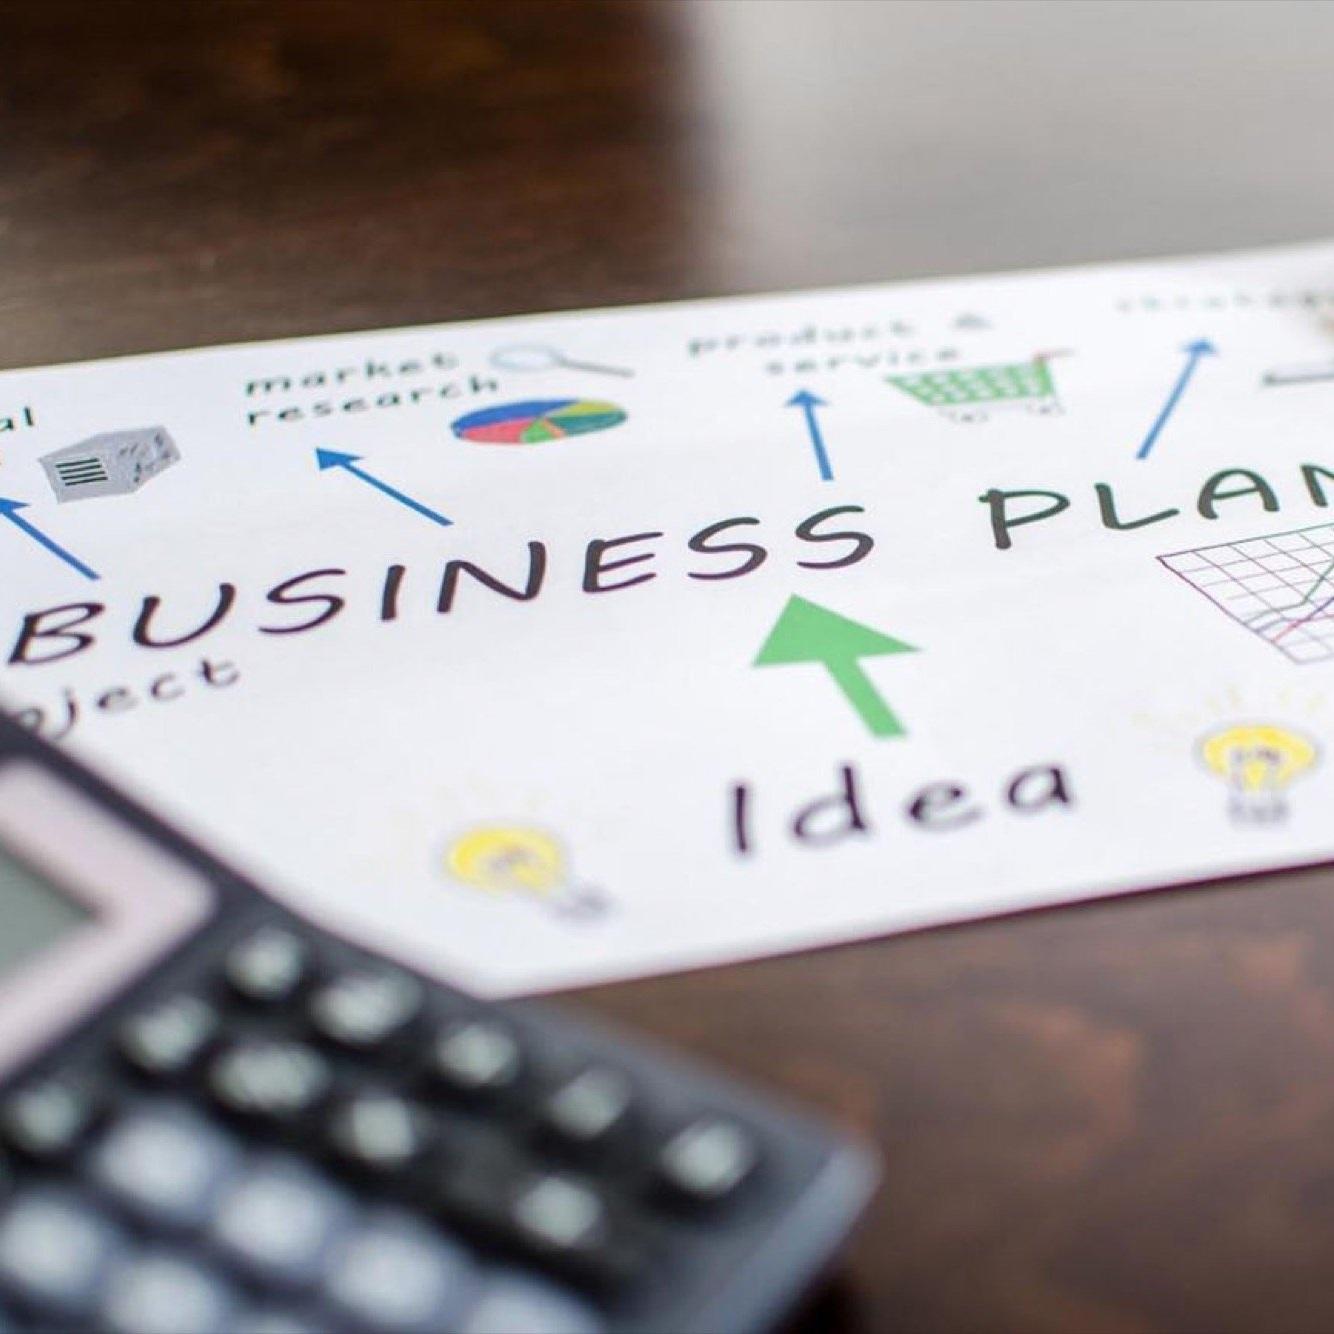 20141201182508-reasons-write-business-plan.jpg